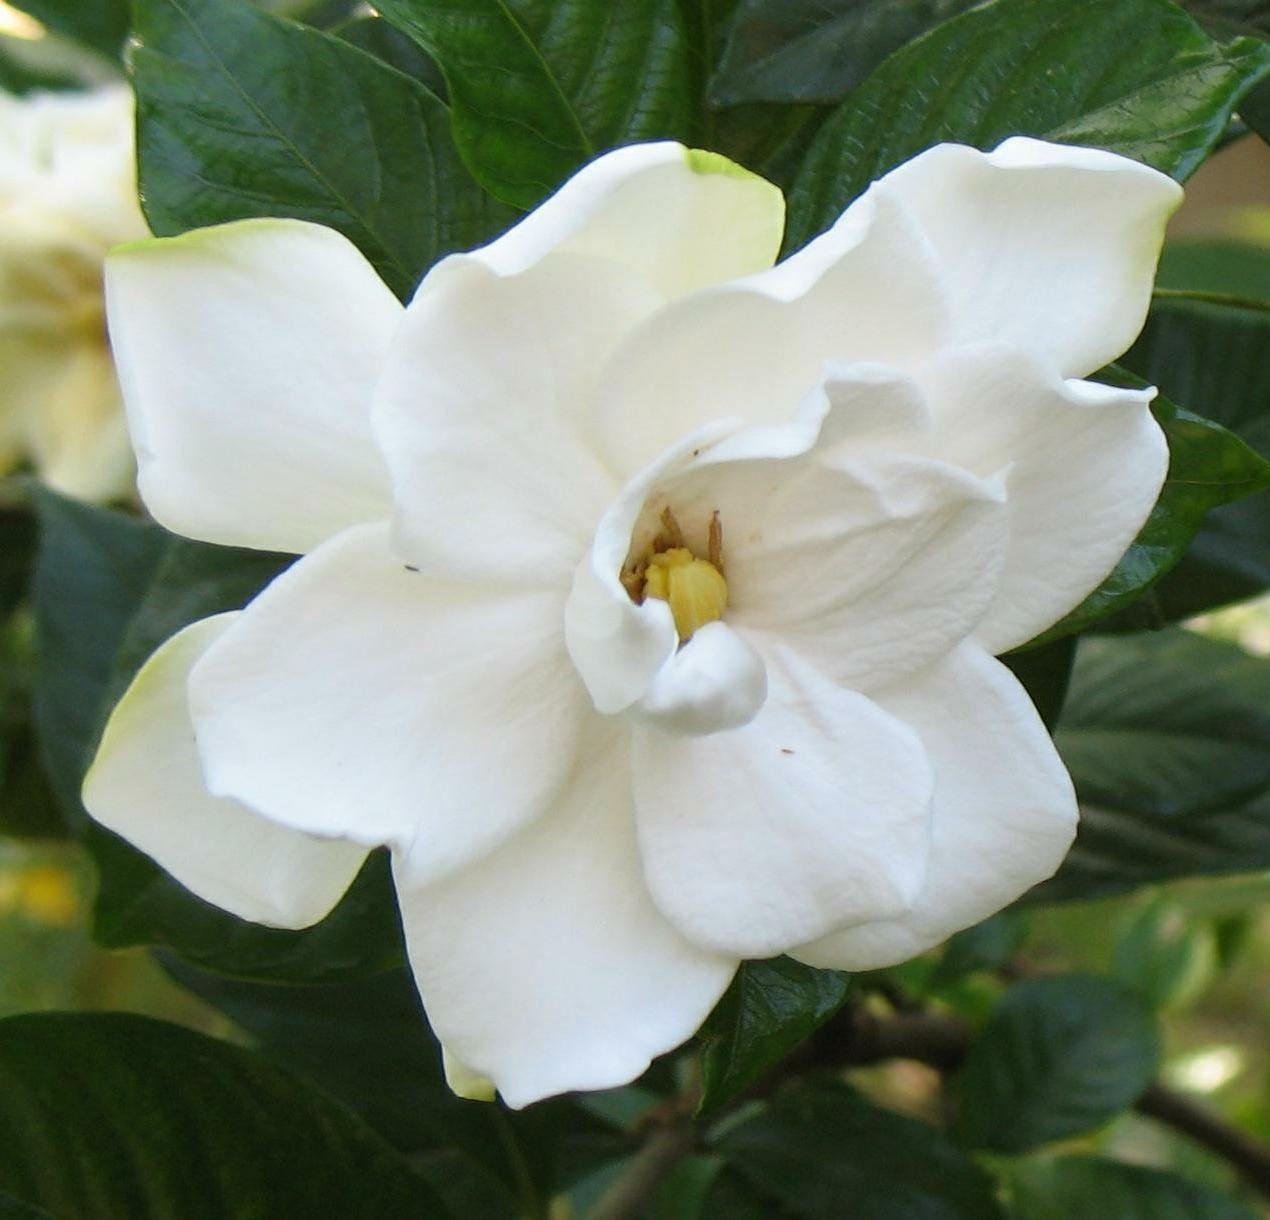 300 seeds gardenia jasminoides cape jasmine seeds common etsy zoom izmirmasajfo